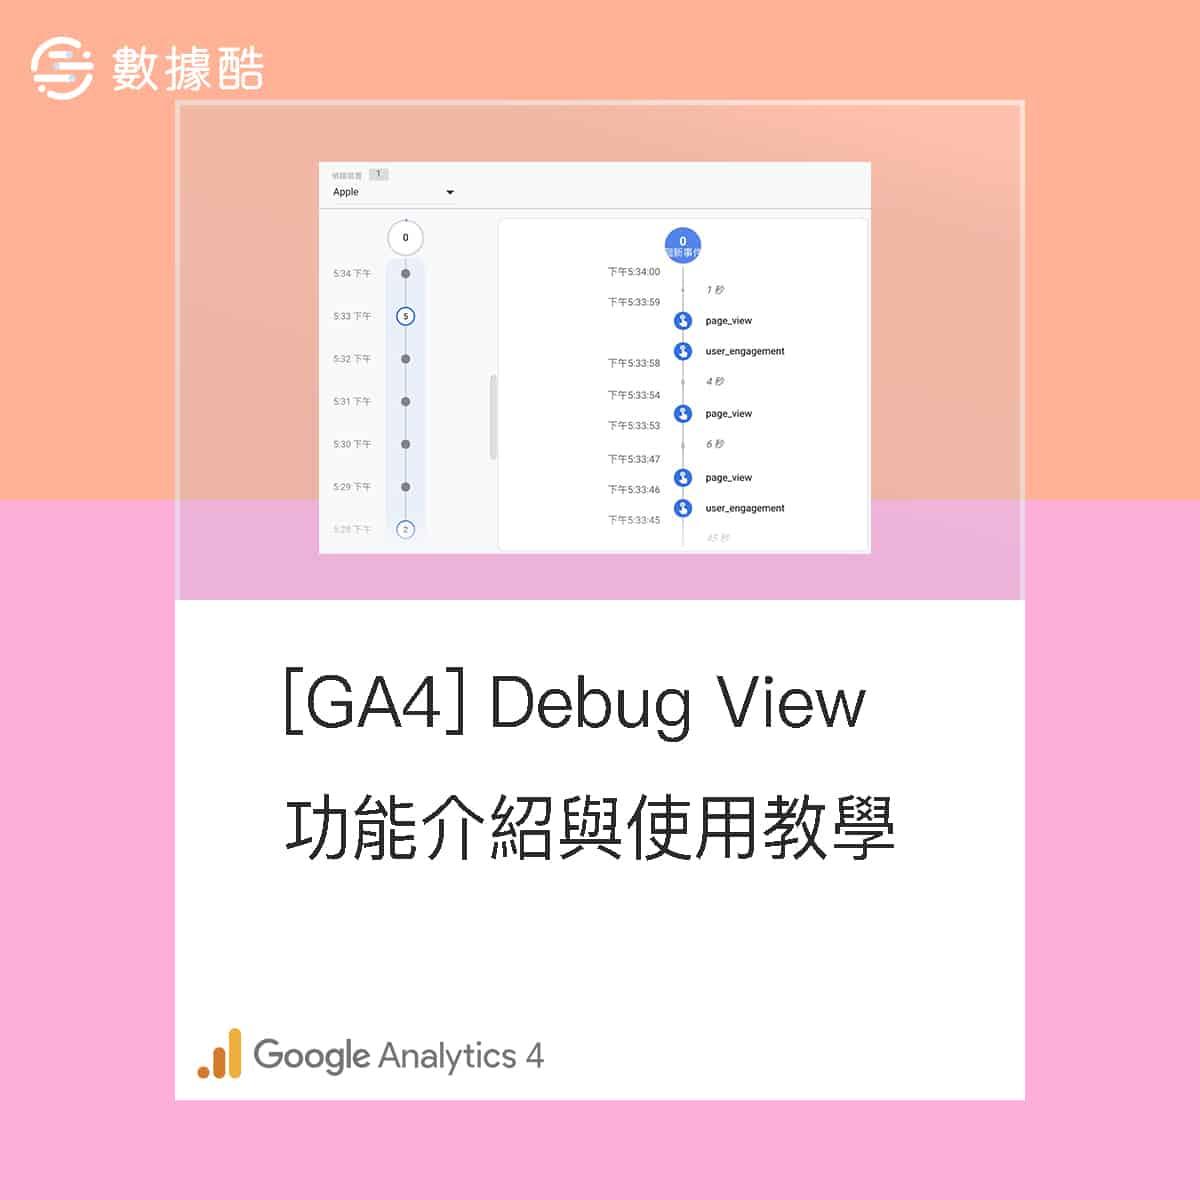 GA4 Debug View 功能介紹與使用教學